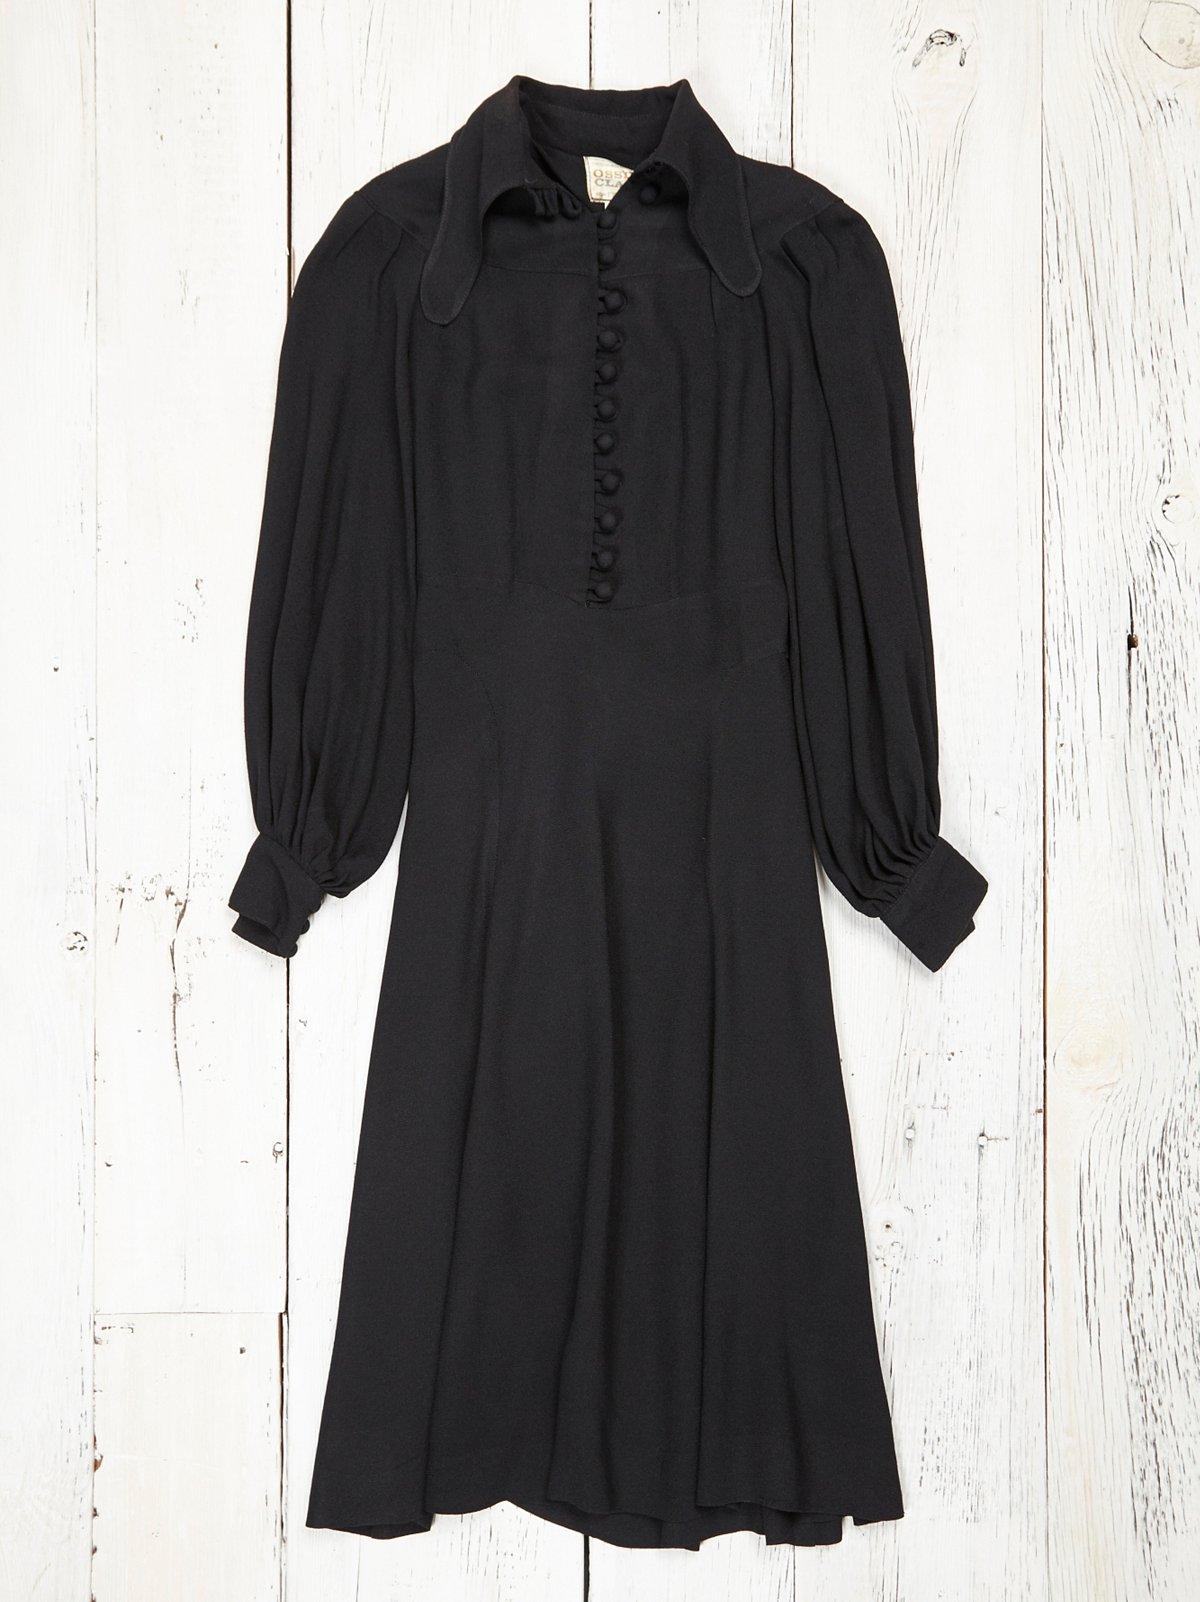 Vintage Ossie Clark Moss Crepe Day Dress